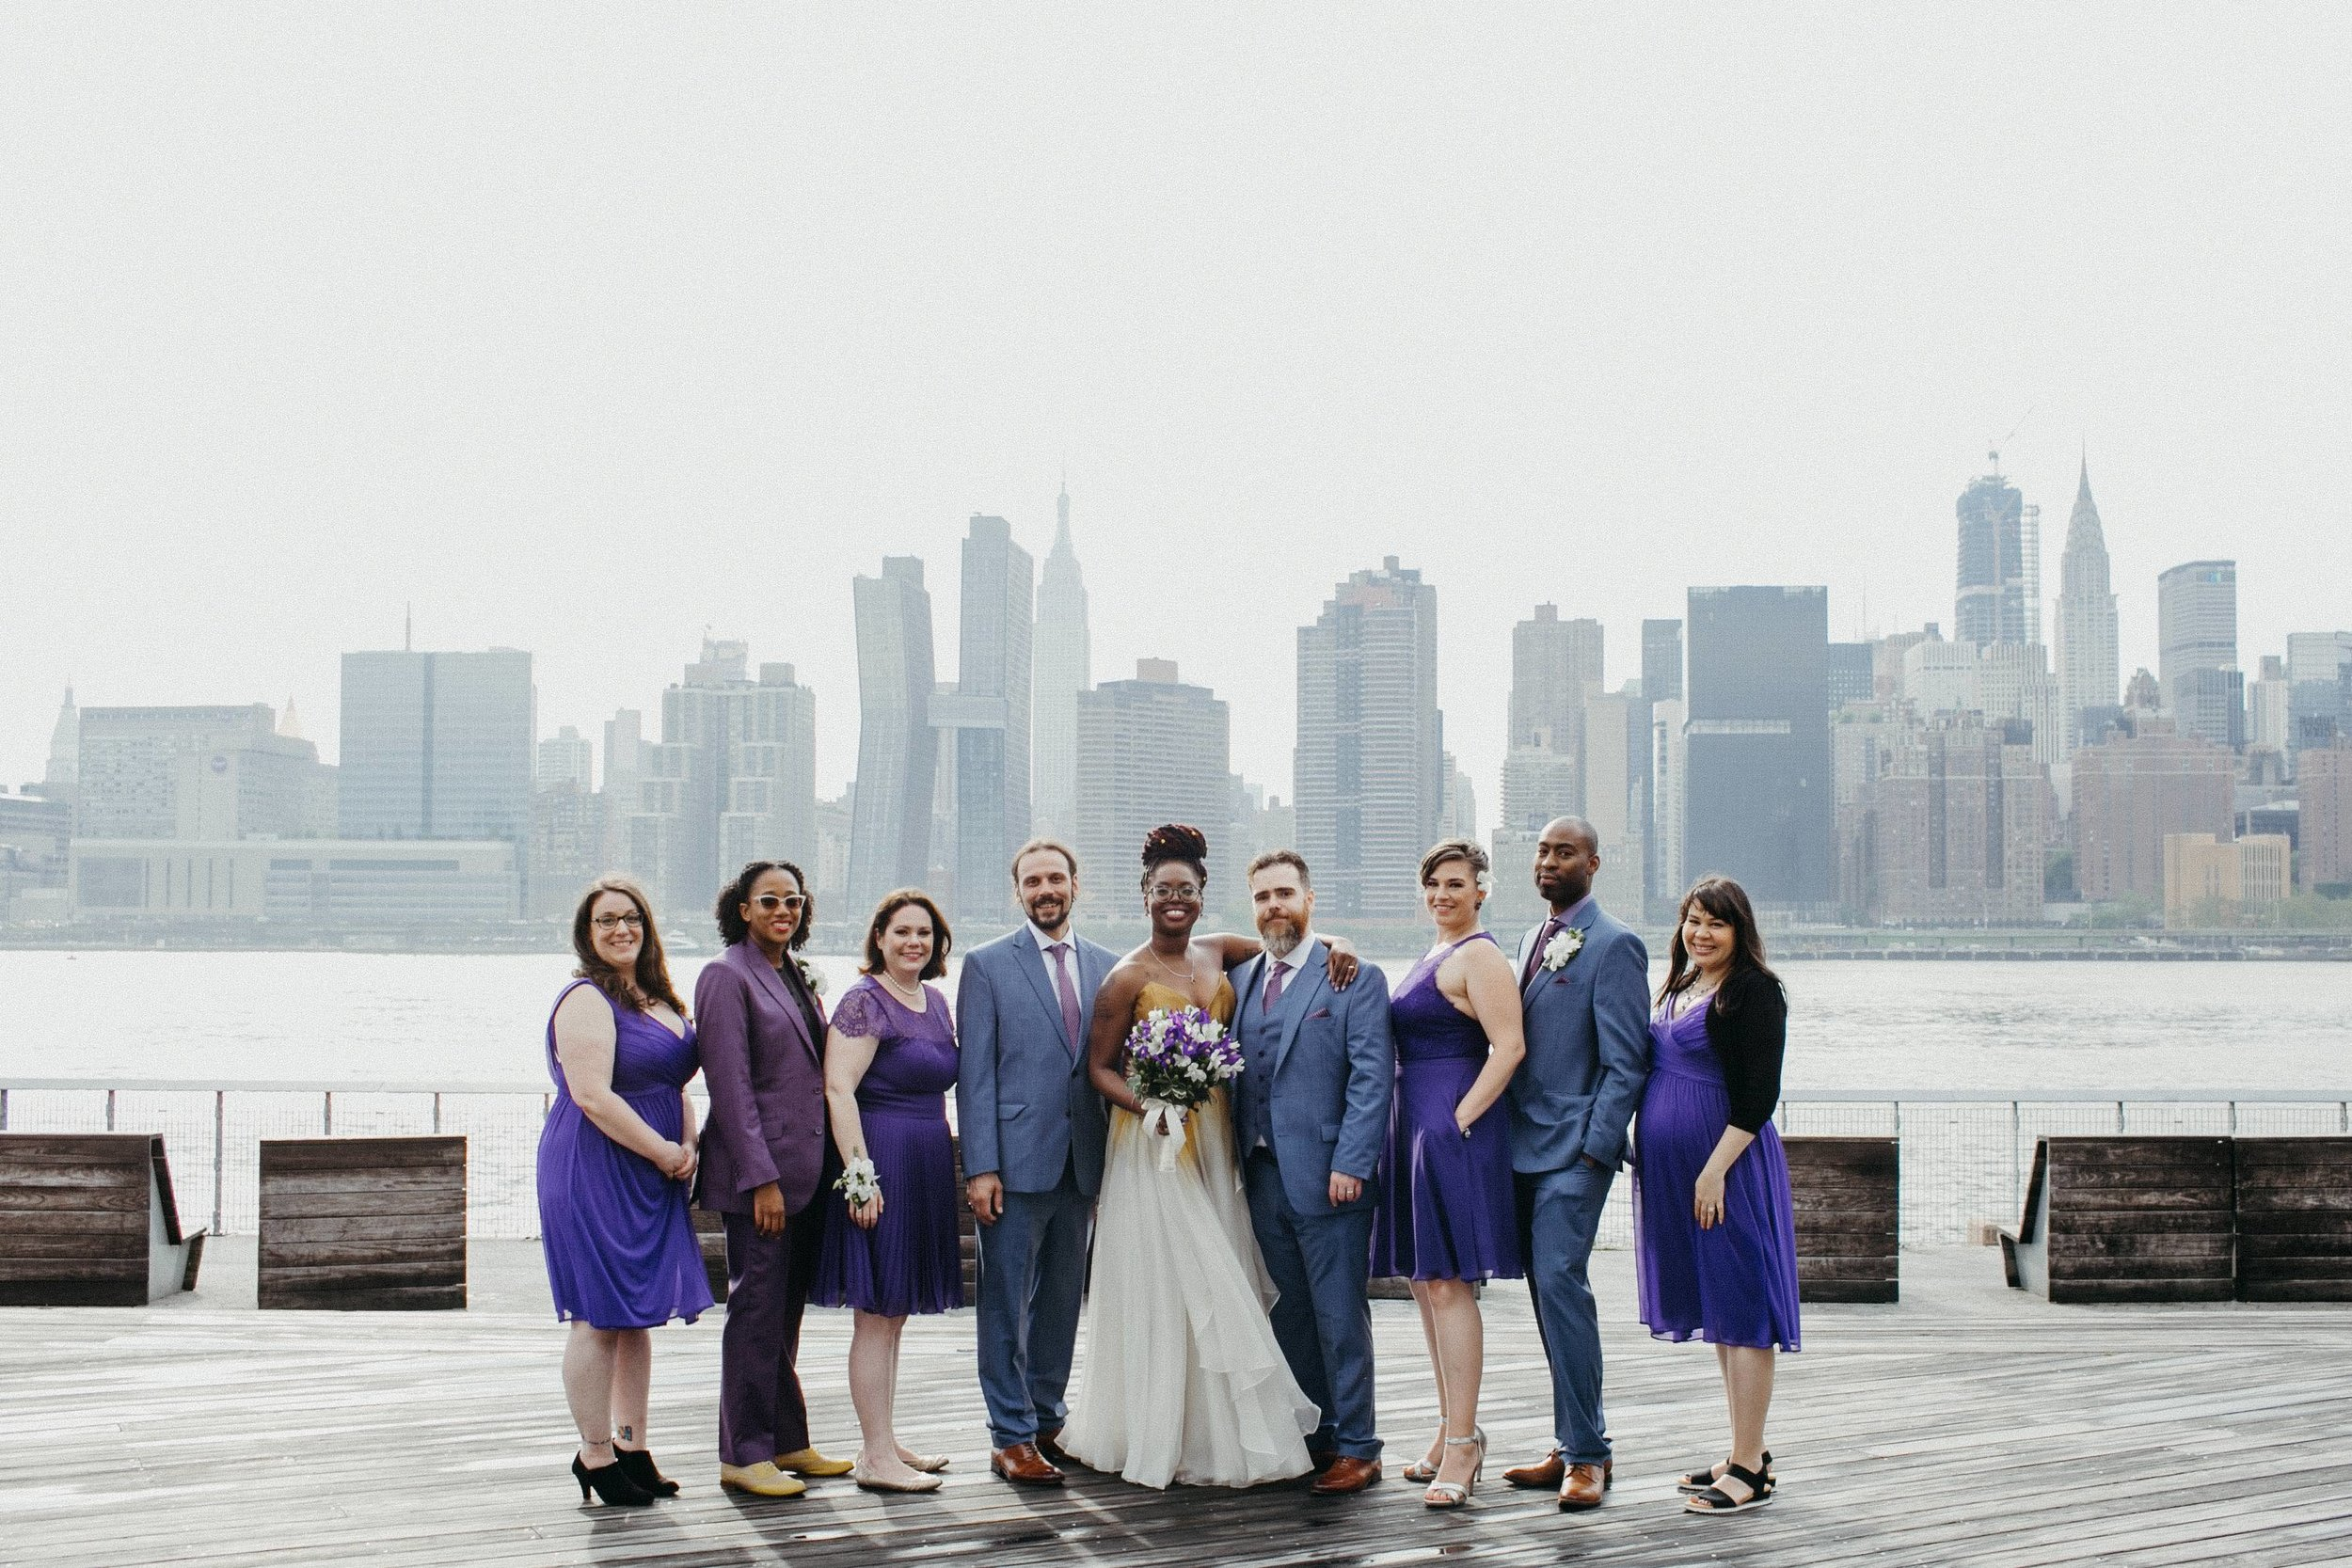 Sevlynn-Photography-Wedding-LIC-Landing-Maiella-NYC-46.jpg